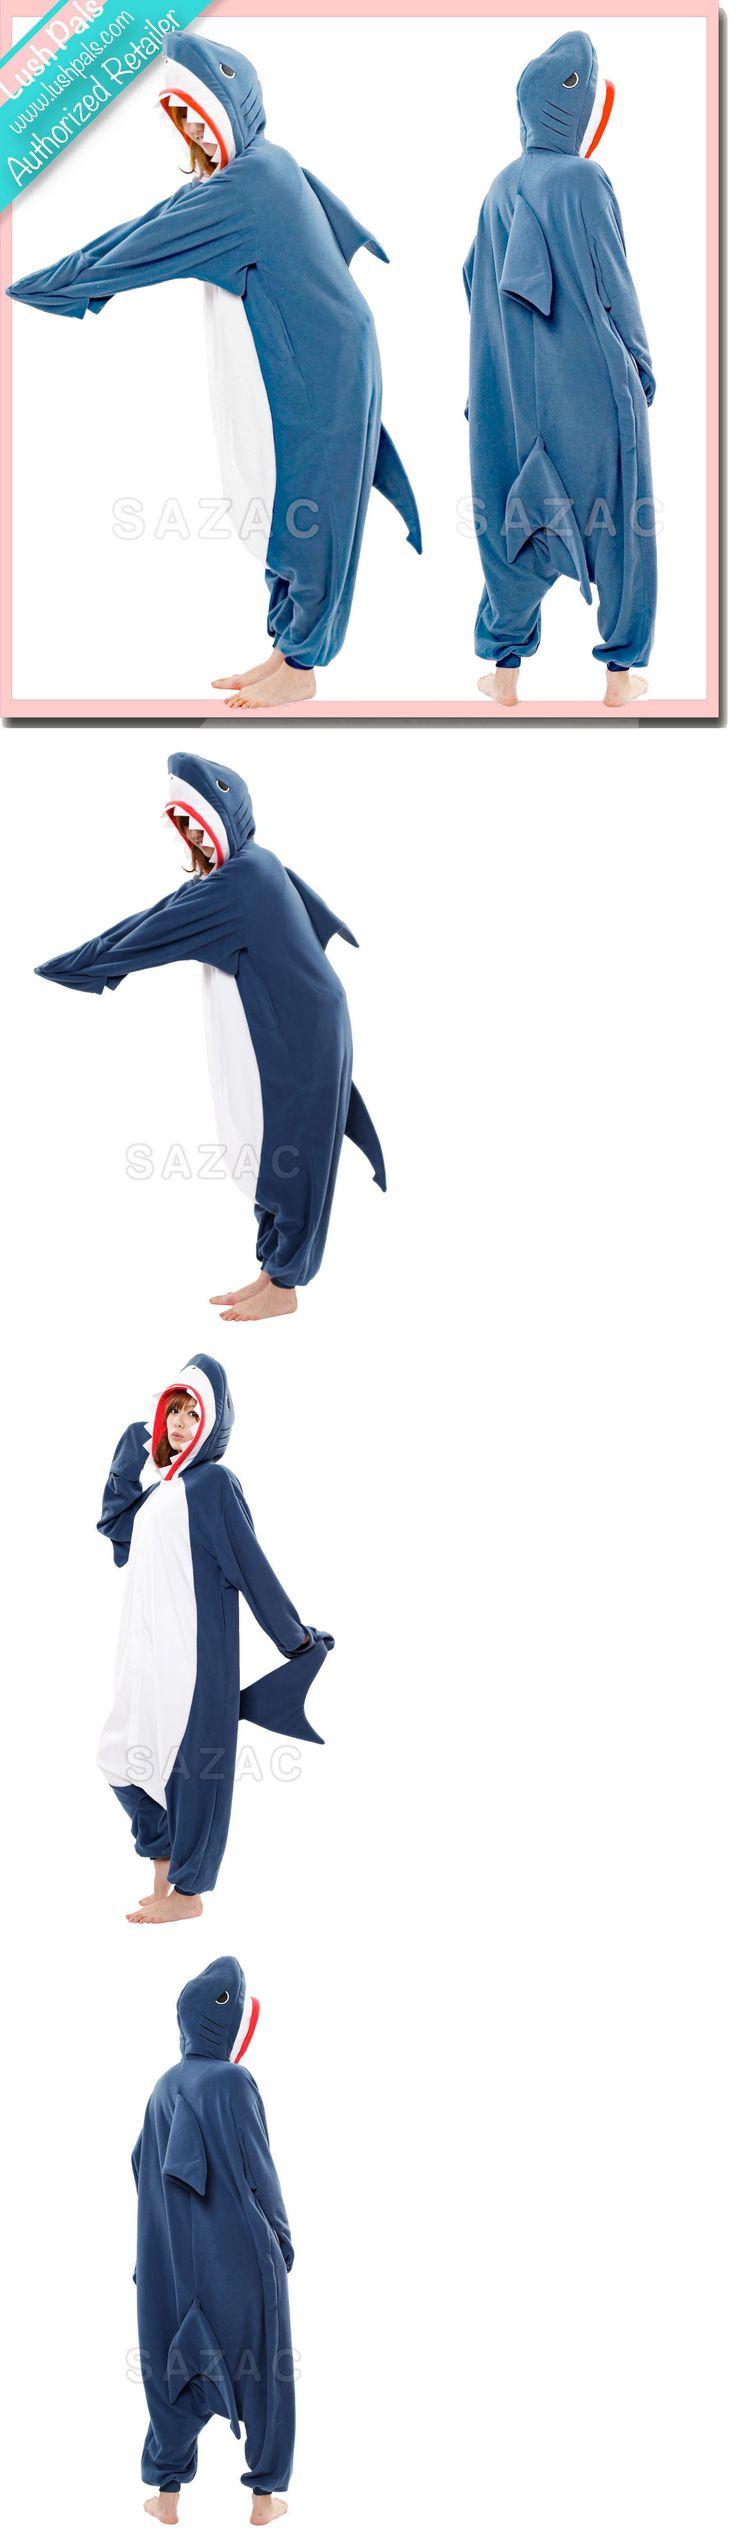 Halloween Costumes: Shark Kigurumi - Adult Costume Shipped From Usa - Sazac Kigurumi Animal Pajamas BUY IT NOW ONLY: $54.0